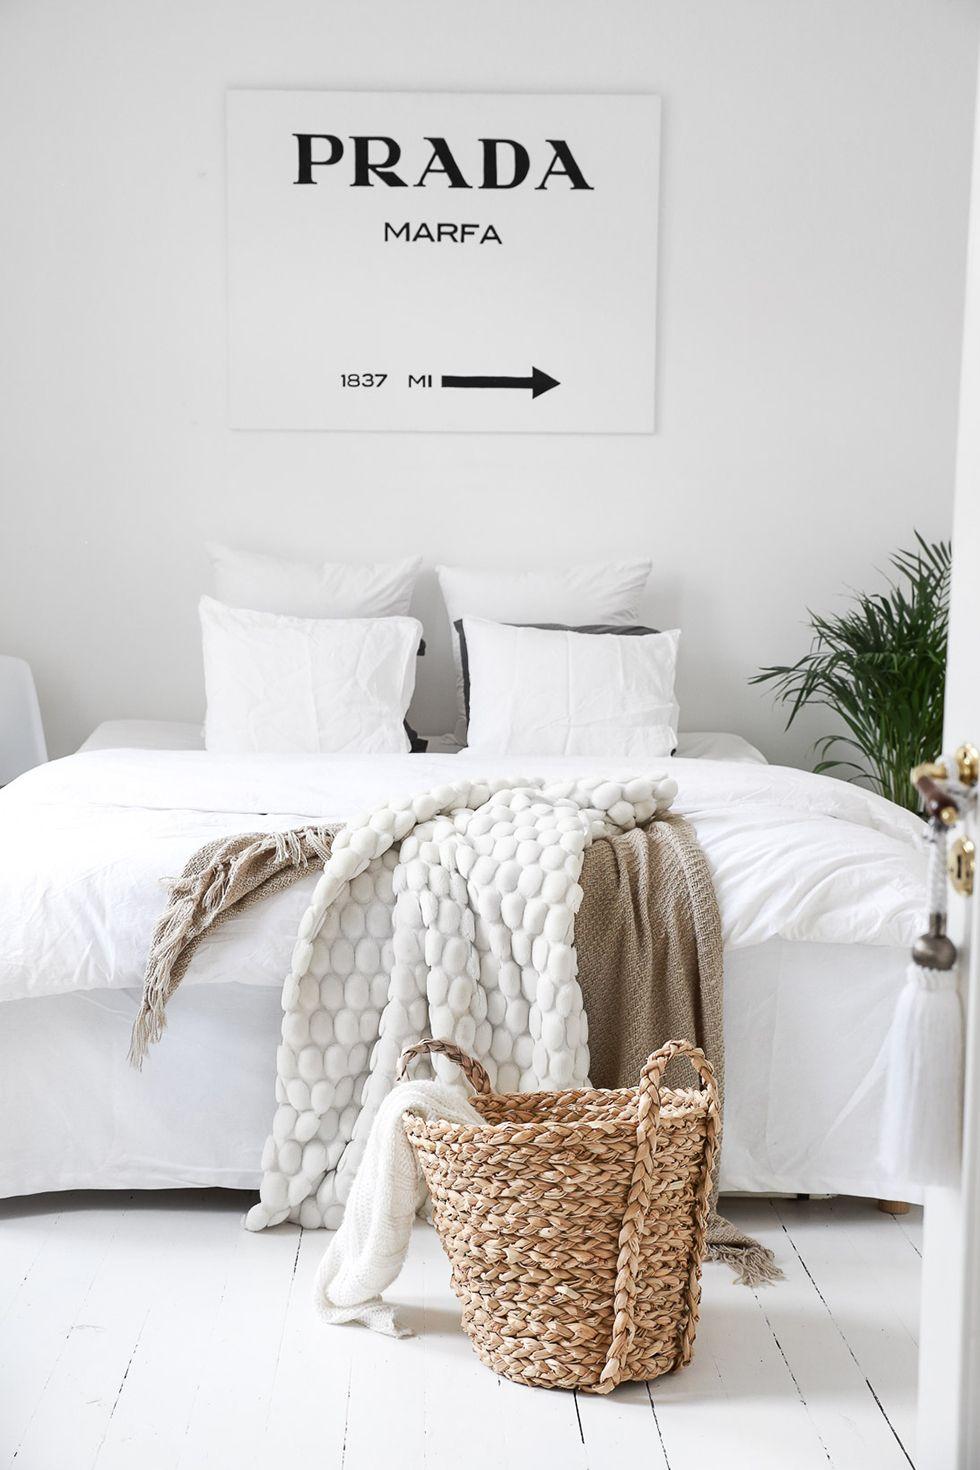 33 All-White Room Ideas for Decor Minimalists | Pinterest | Wohnen ...